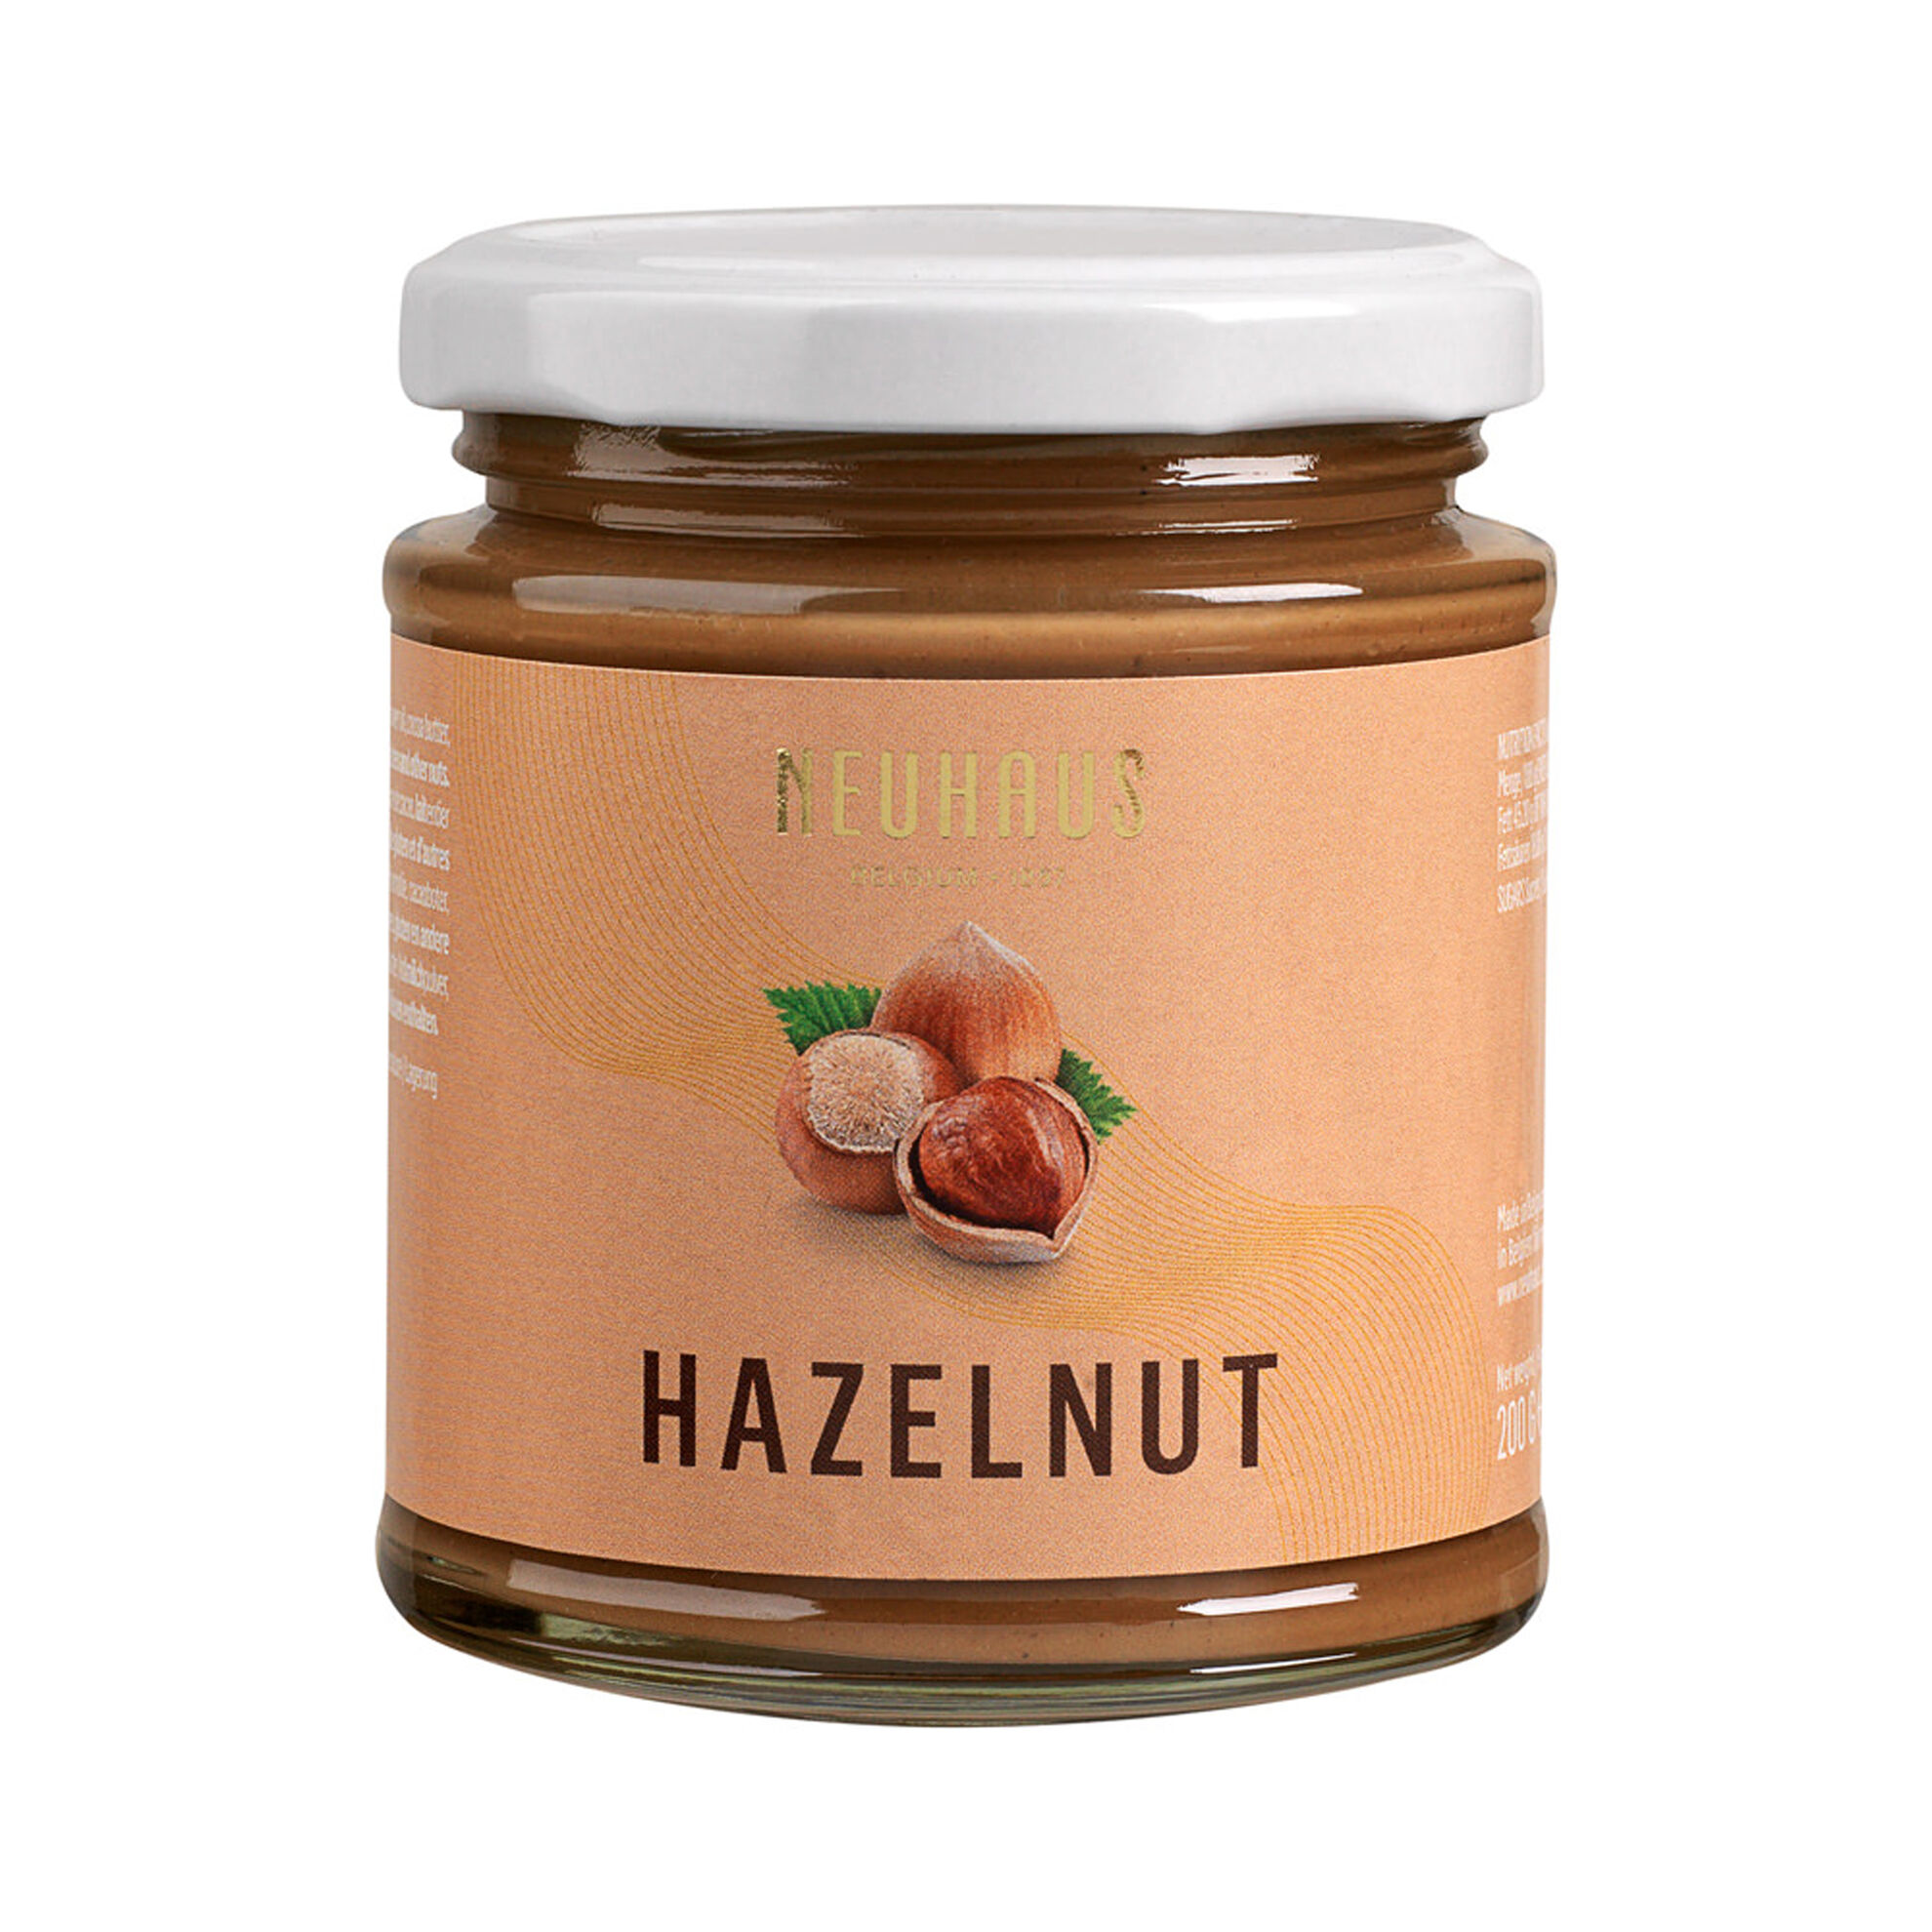 Crunchy Hazelnut Spread image number 01